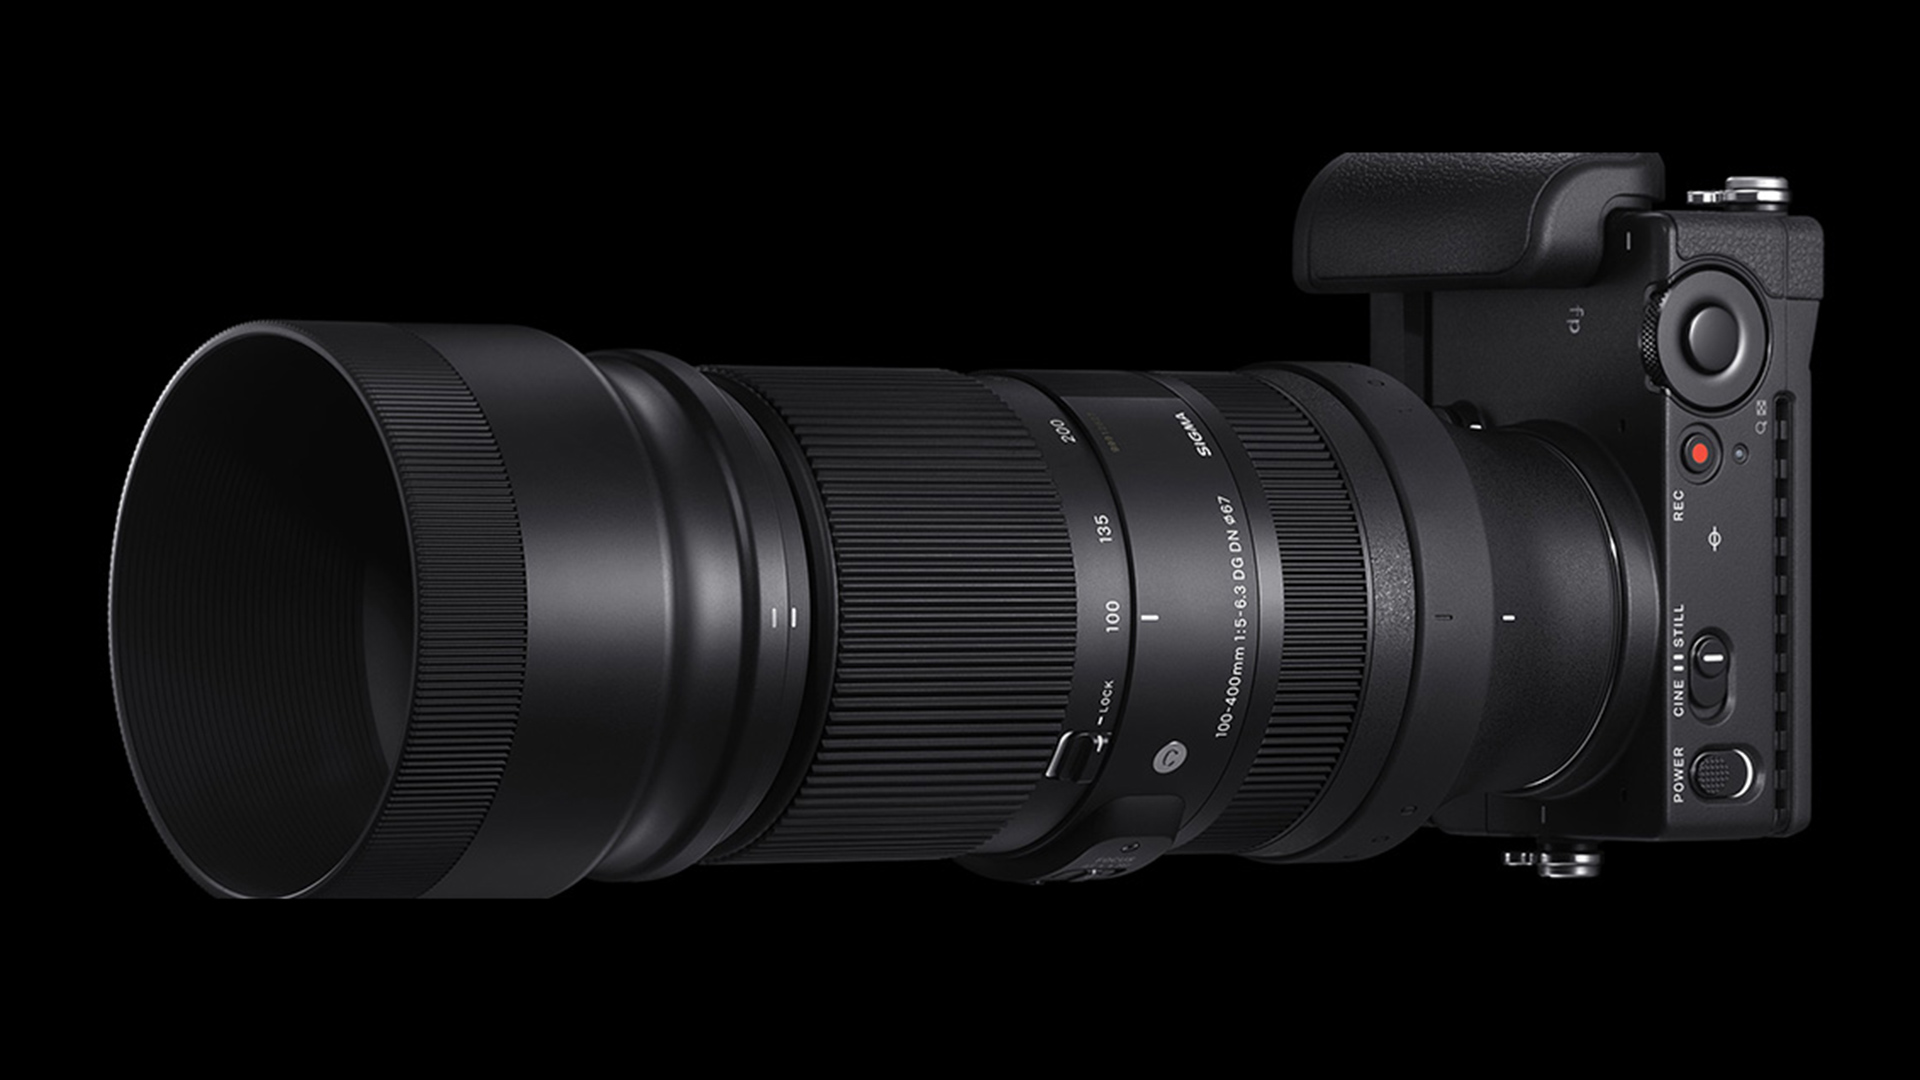 Sigma 100-400mm F5-6.3 DG DN OS Contemporary lens